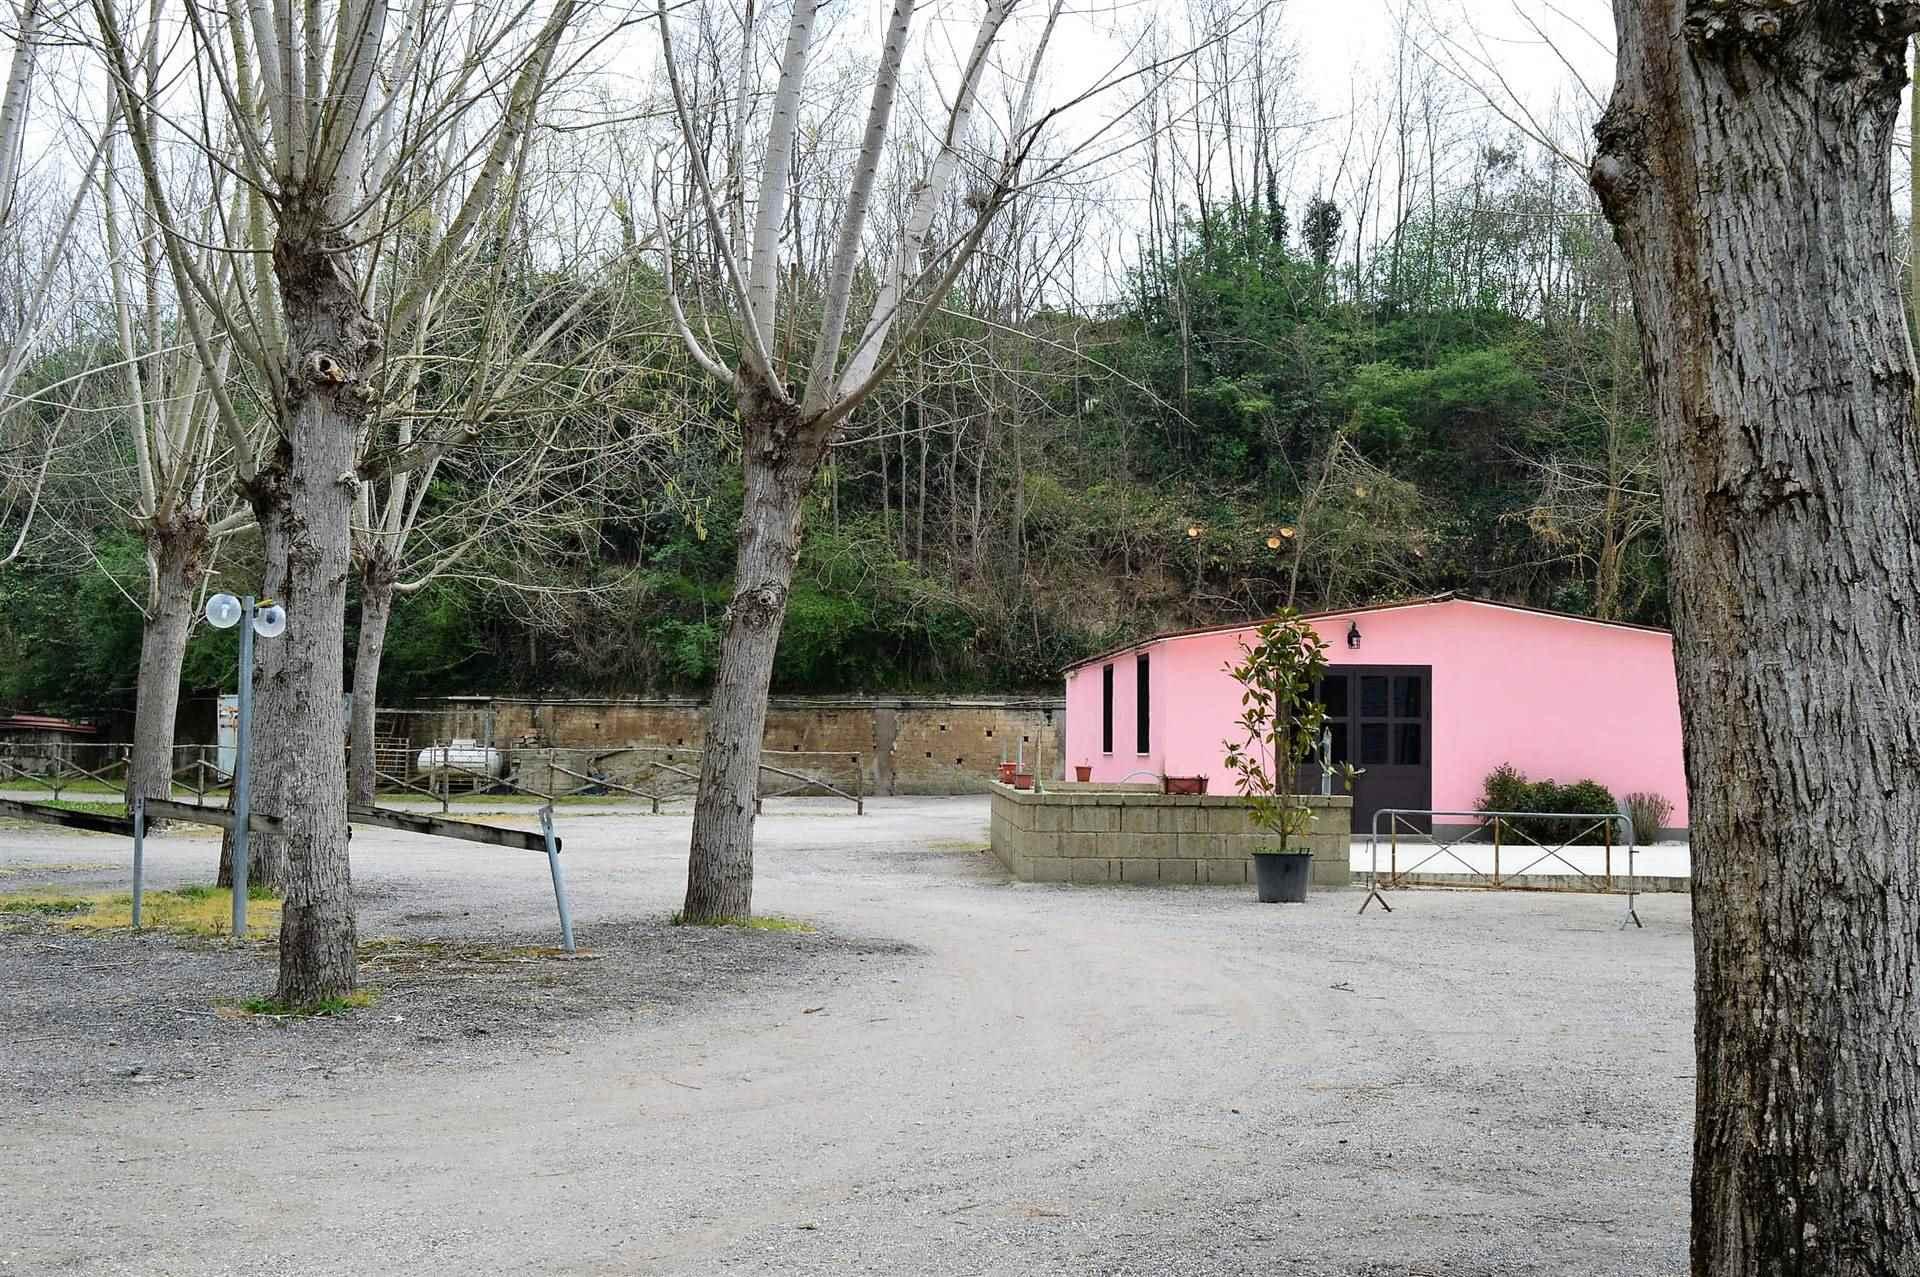 LV044B-Attivita Commerciale-PONTELATONE-Via-Ponte-Pellegrino